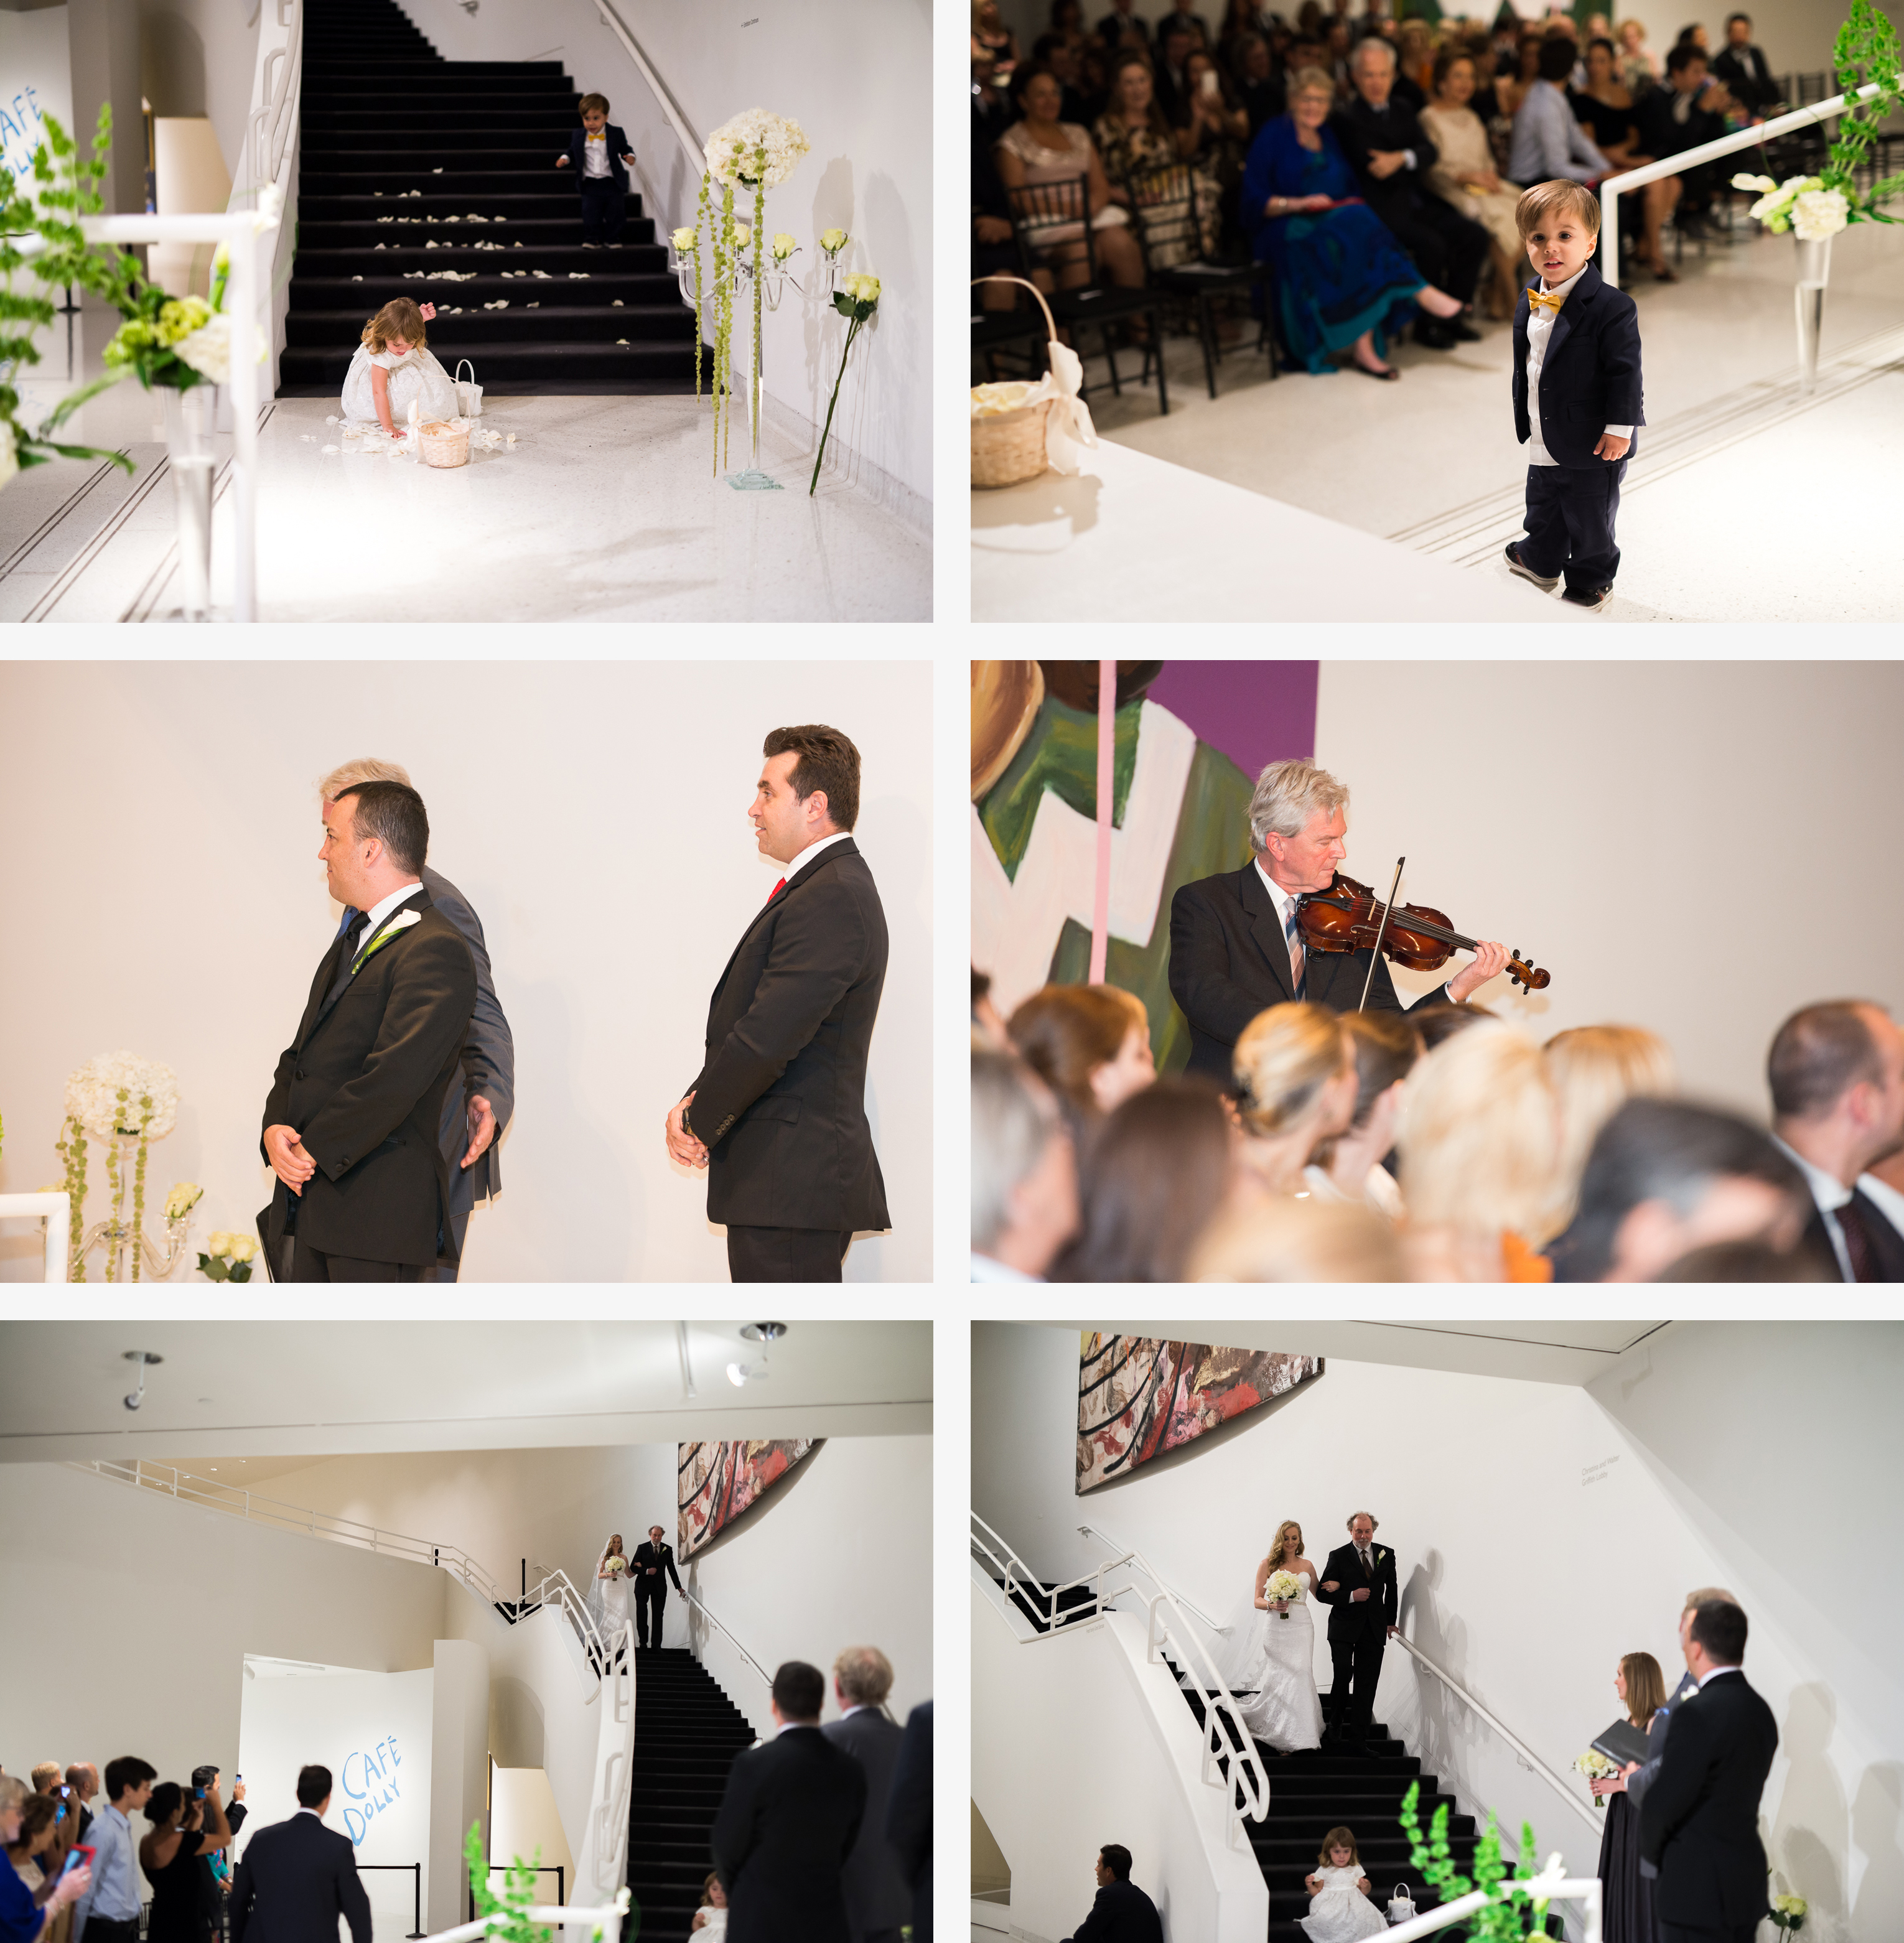 brandwold.se-miami-wedding-fortlauderdale-105